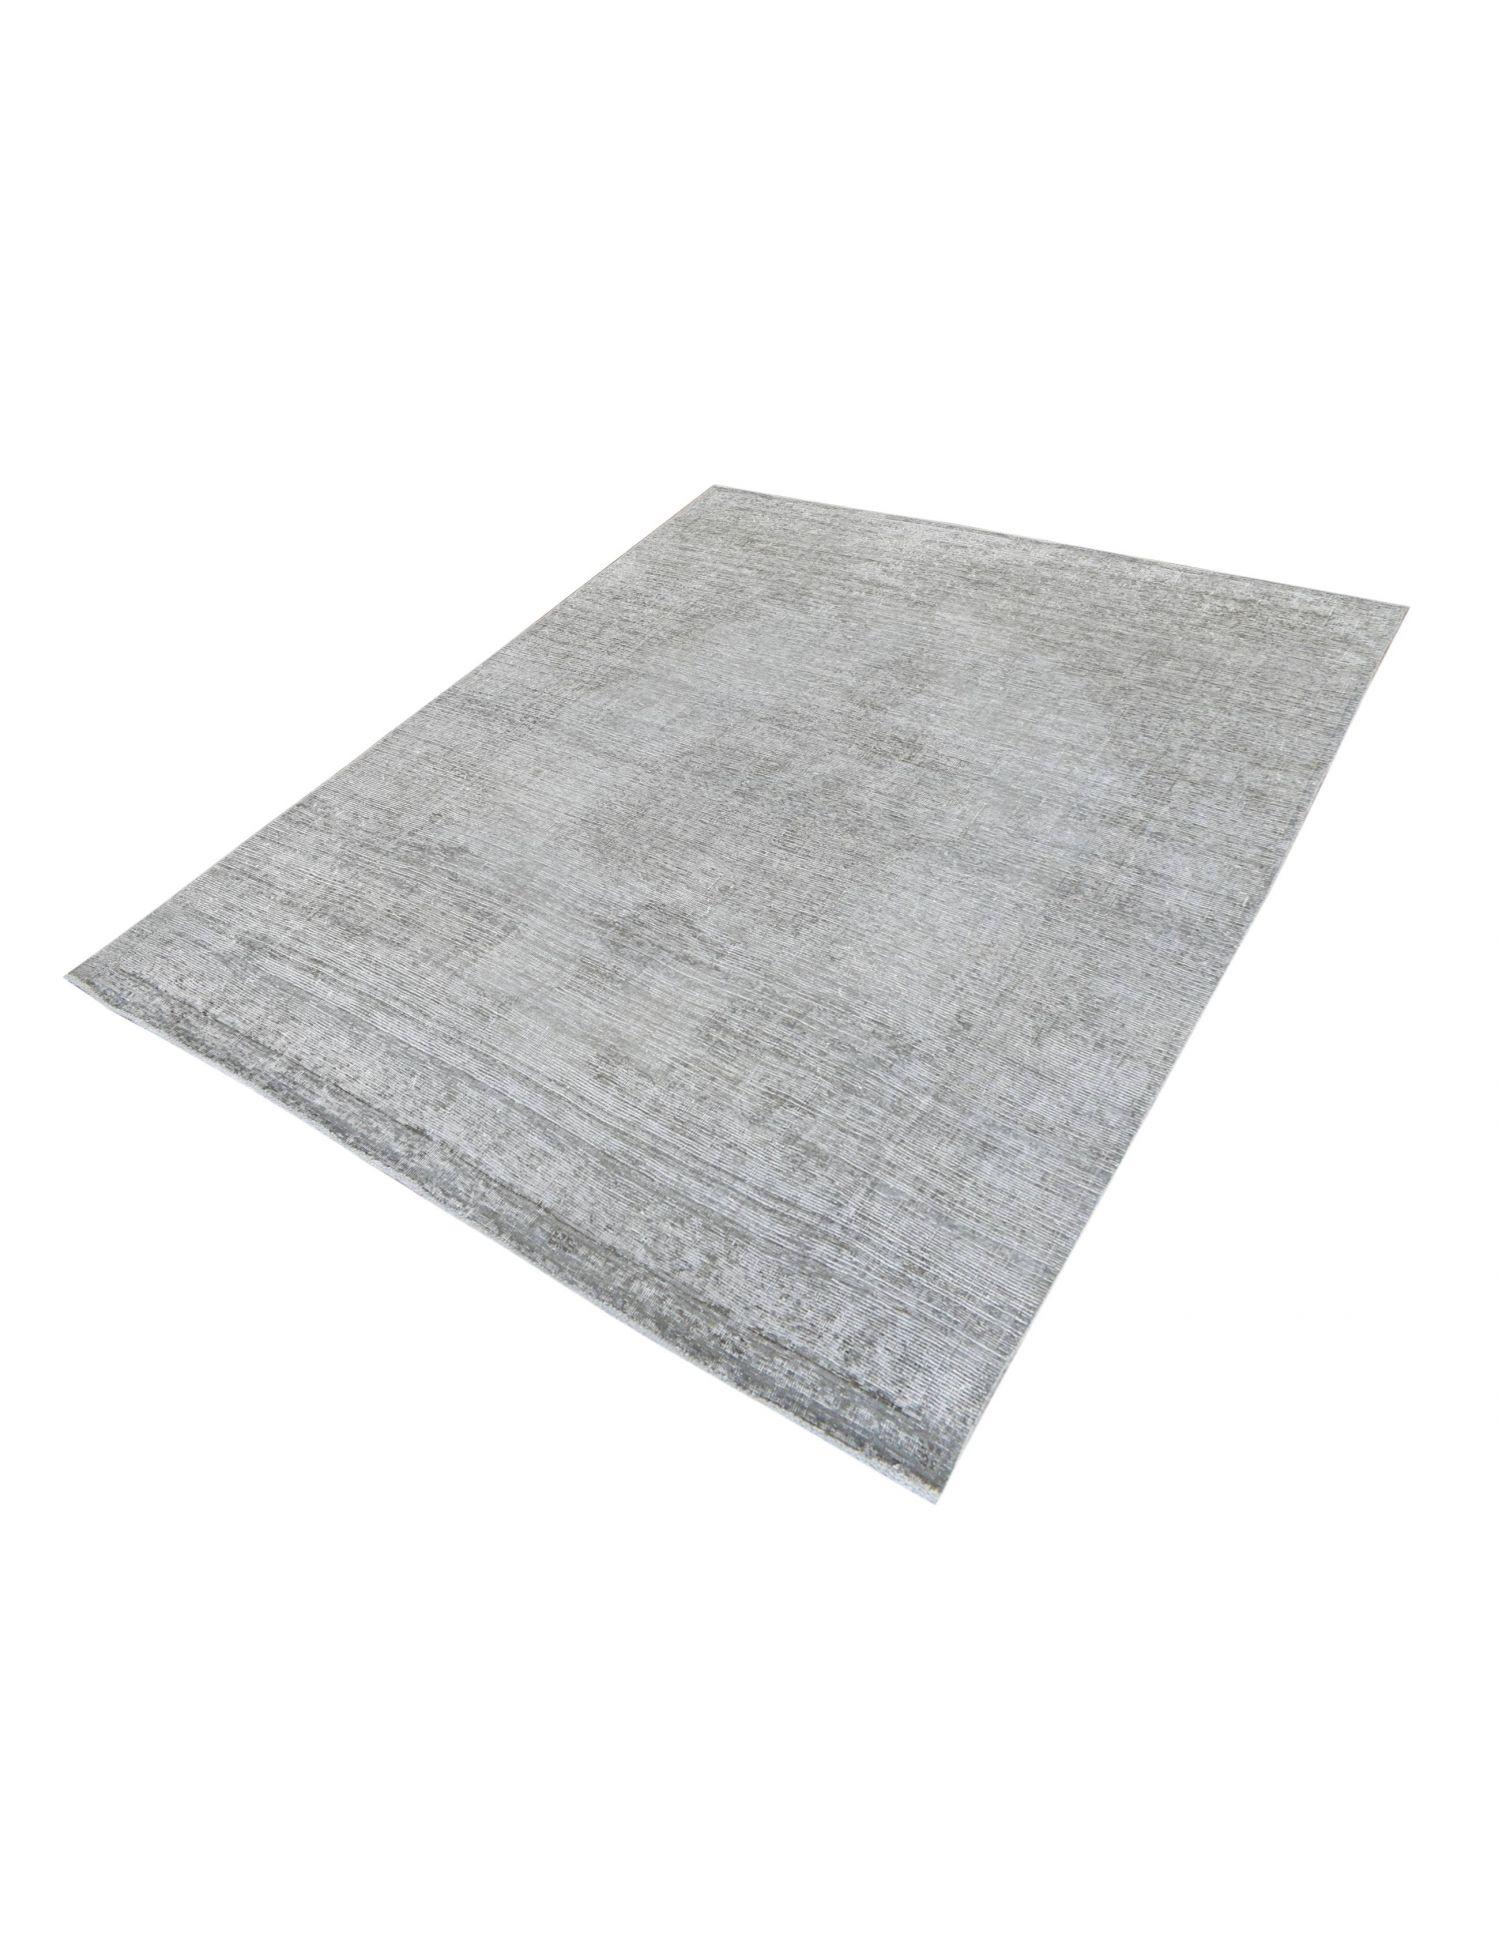 Vintage Teppich  grau <br/>251 x 212 cm